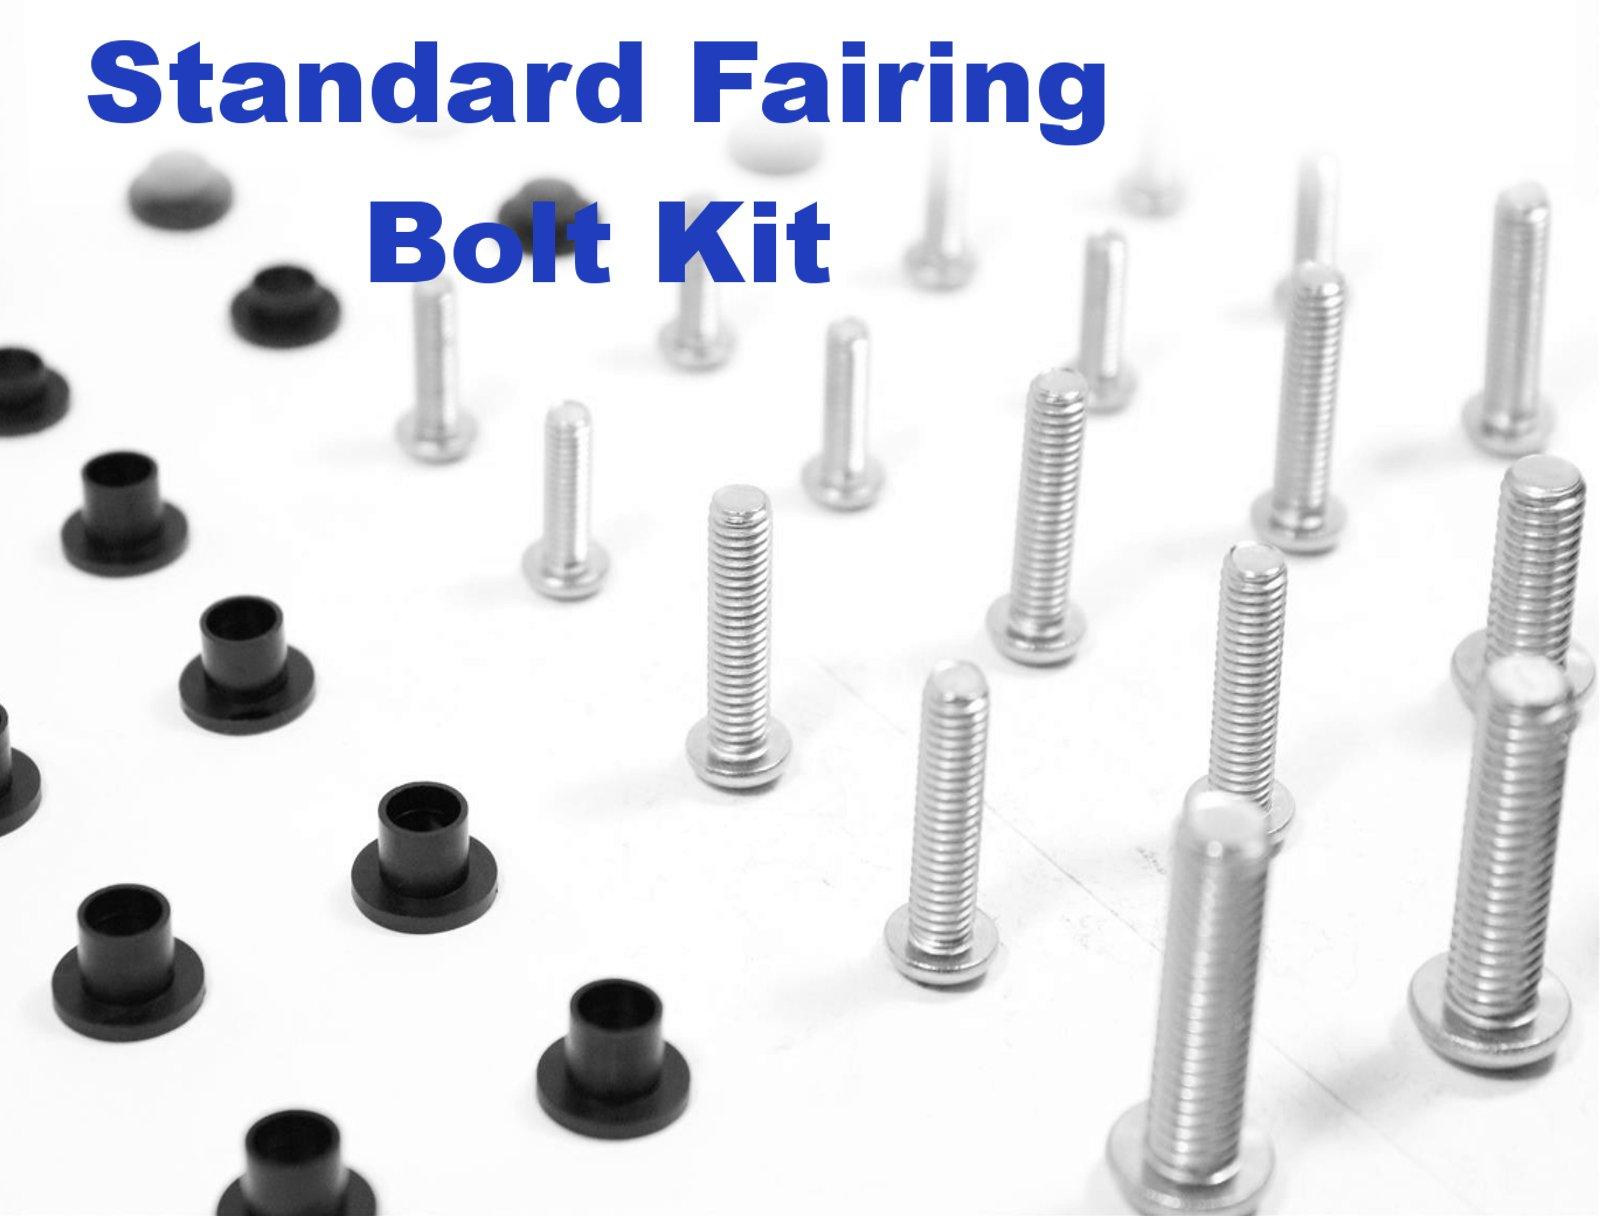 Standard Motorcycle Fairing Bolt Kit Honda CBR954RR 2002 - 2003 Body Screws, Fasteners, and Hardware